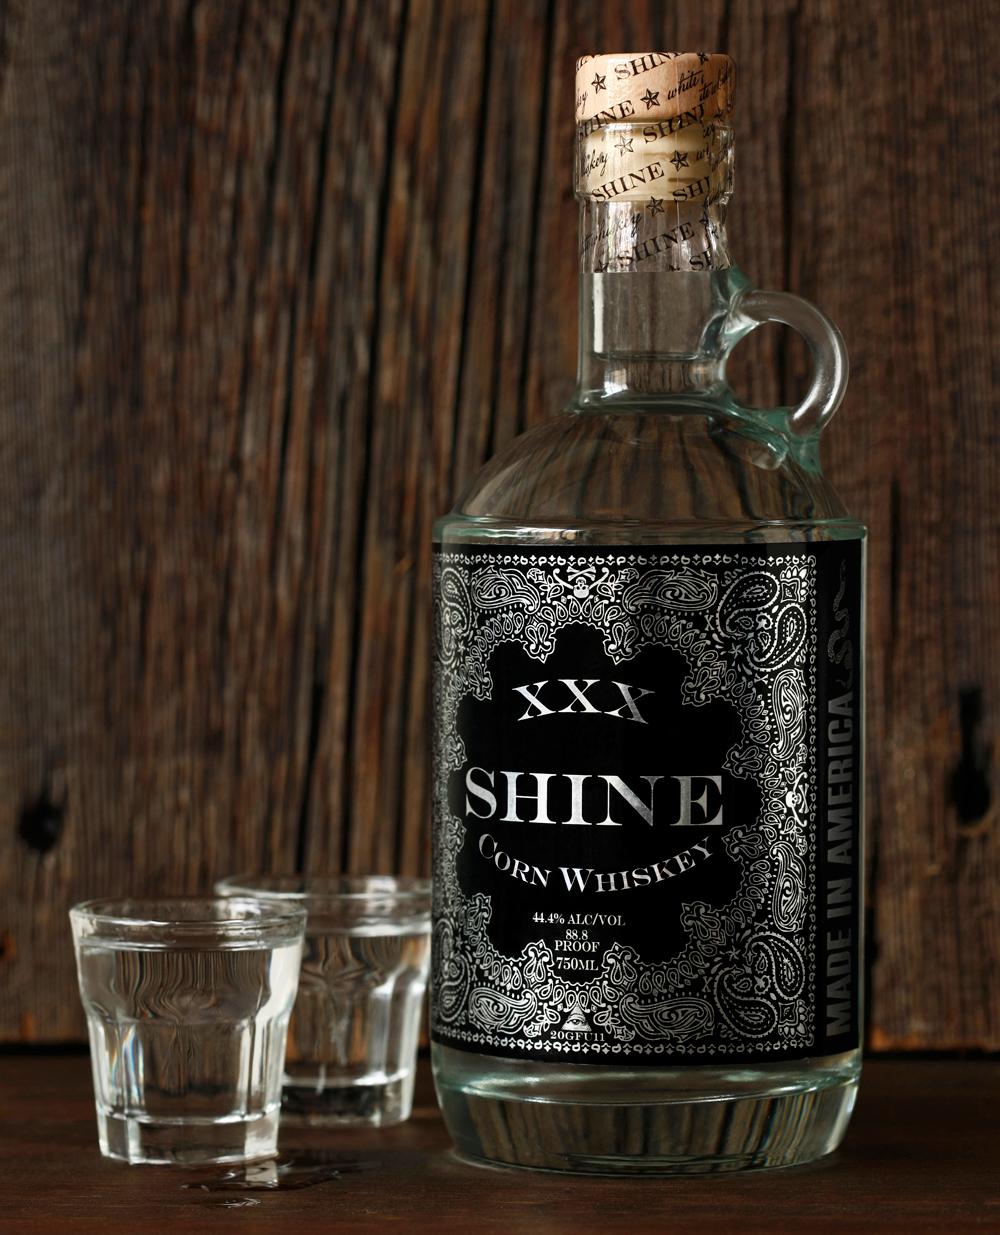 XXXSHINE-Whiskey-bottle-WEBID26©-1000